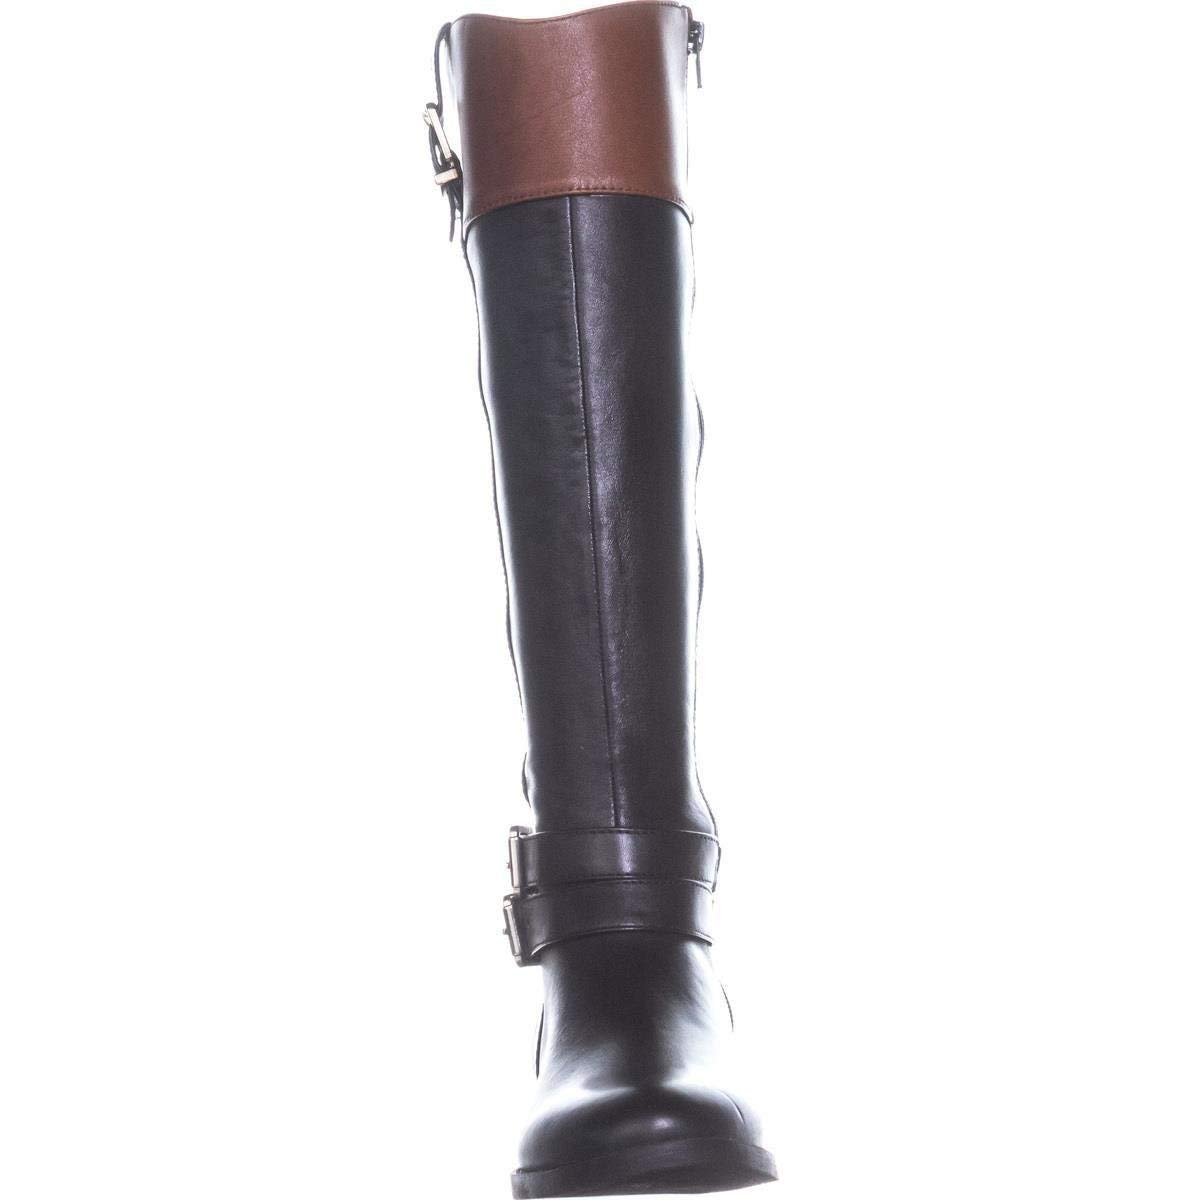 Size 11.0 Black INC International Concepts Womens Frankll Closed Toe Knee High